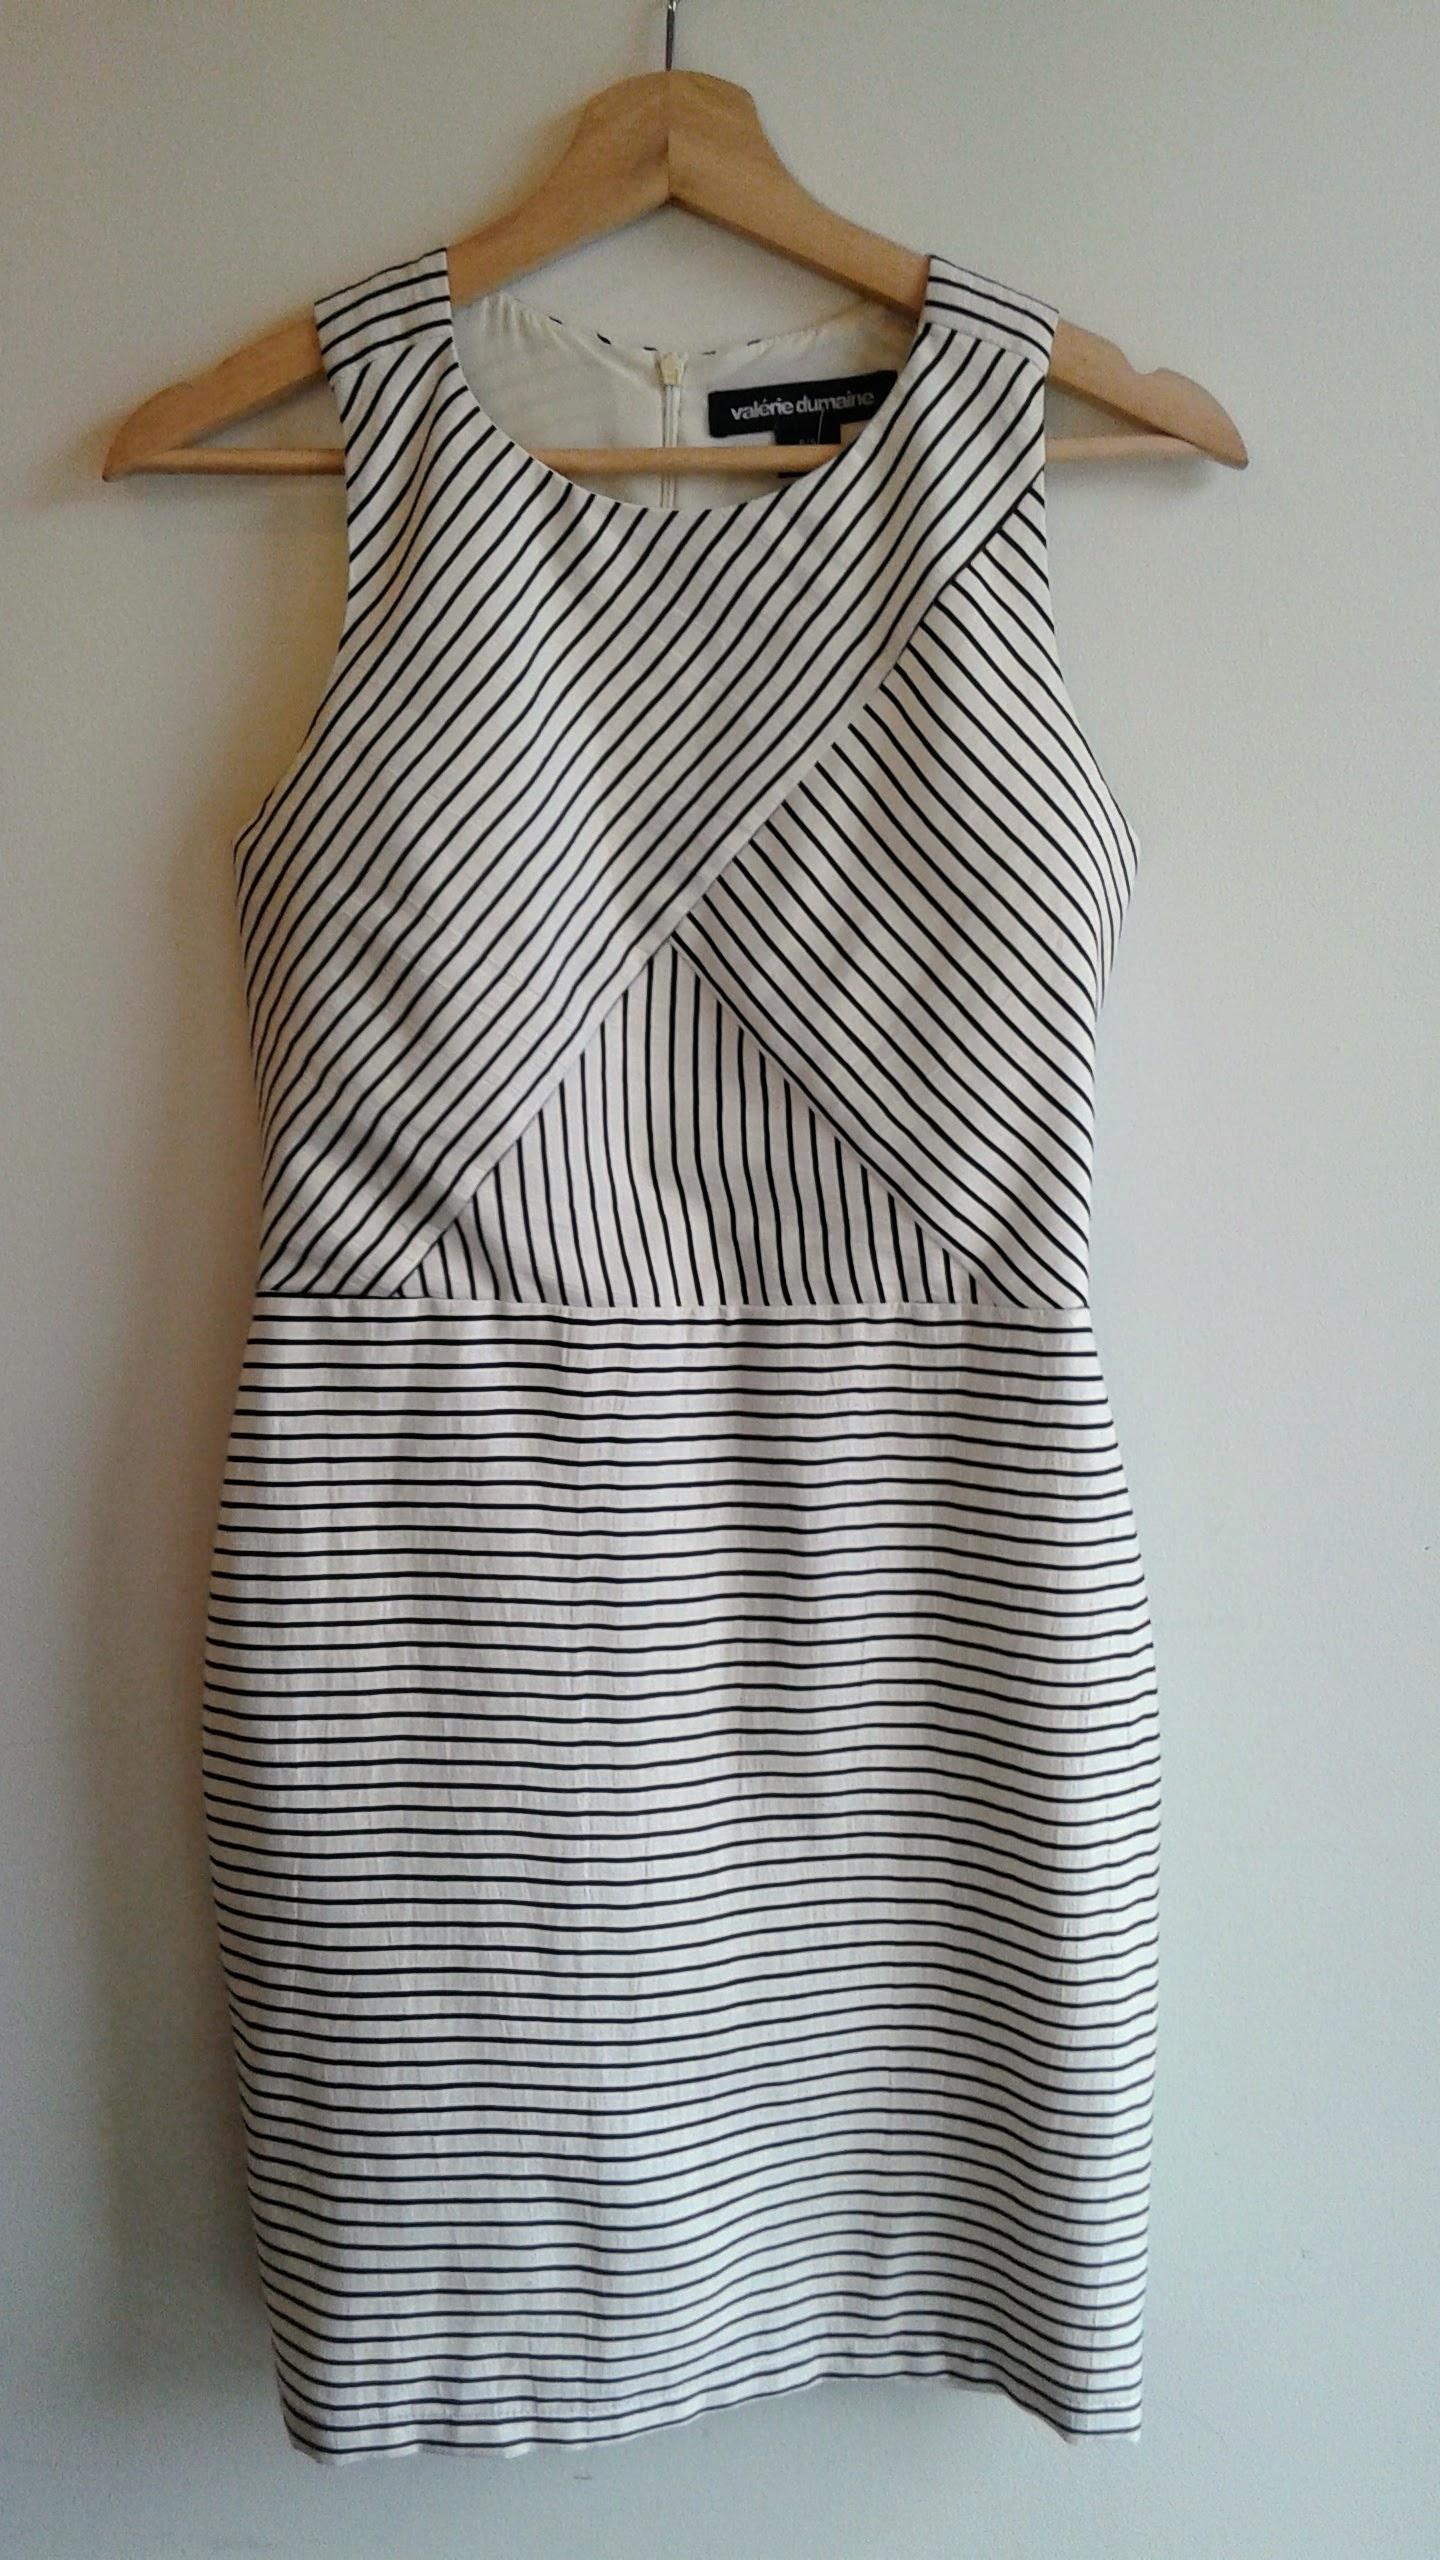 Valerie Dumaine dress; Size S, $52